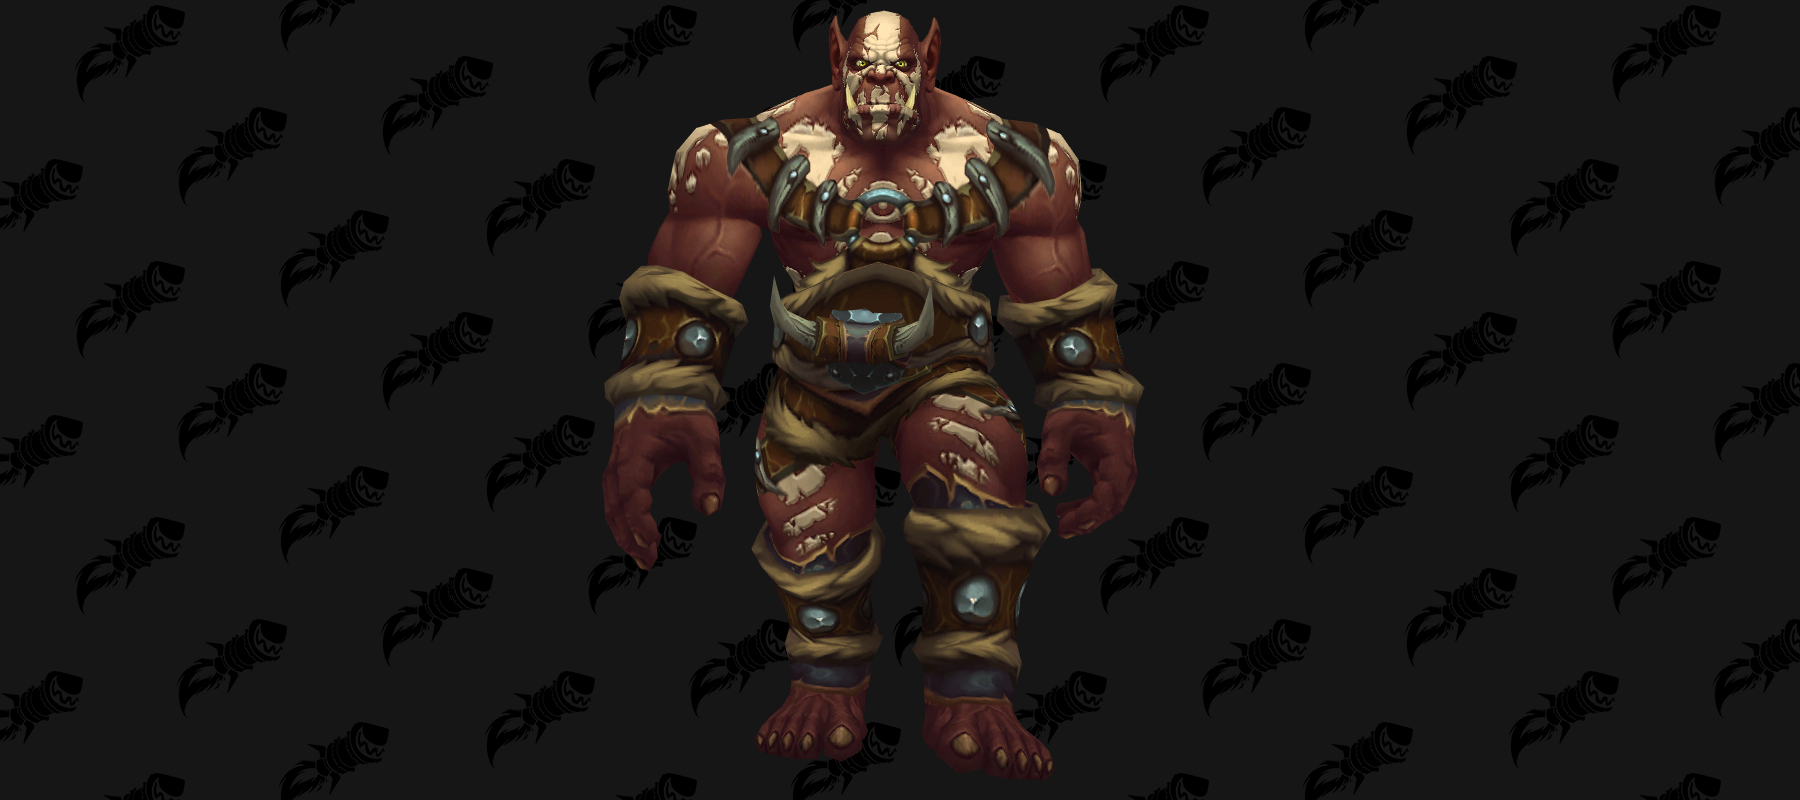 Les Orcs Mag'har viennent du Draenor de Warlords of Draenor